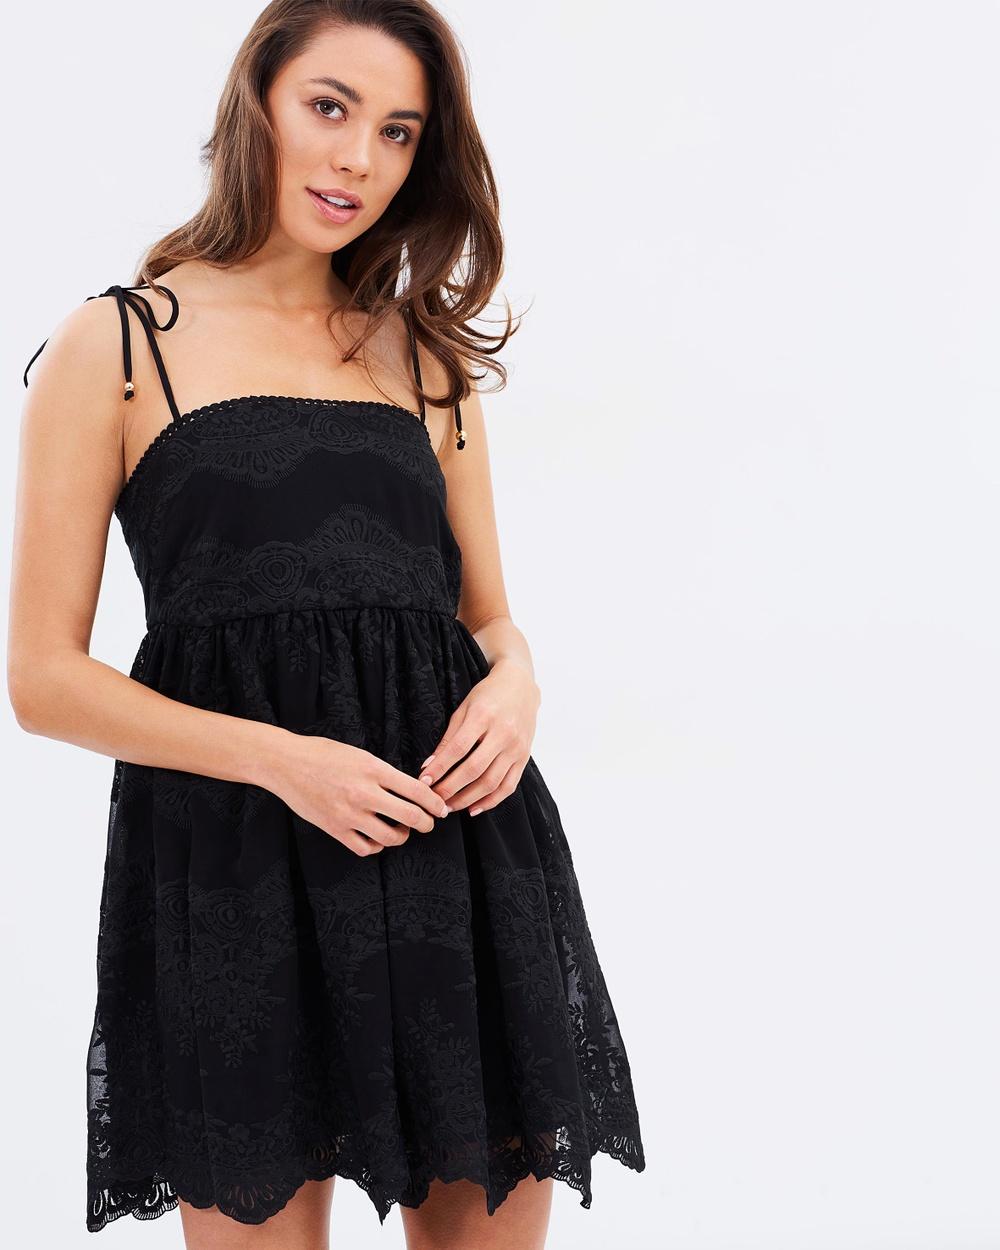 Shona Joy Antigua Baby Doll Mini Dress Dresses Black Antigua Baby Doll Mini Dress